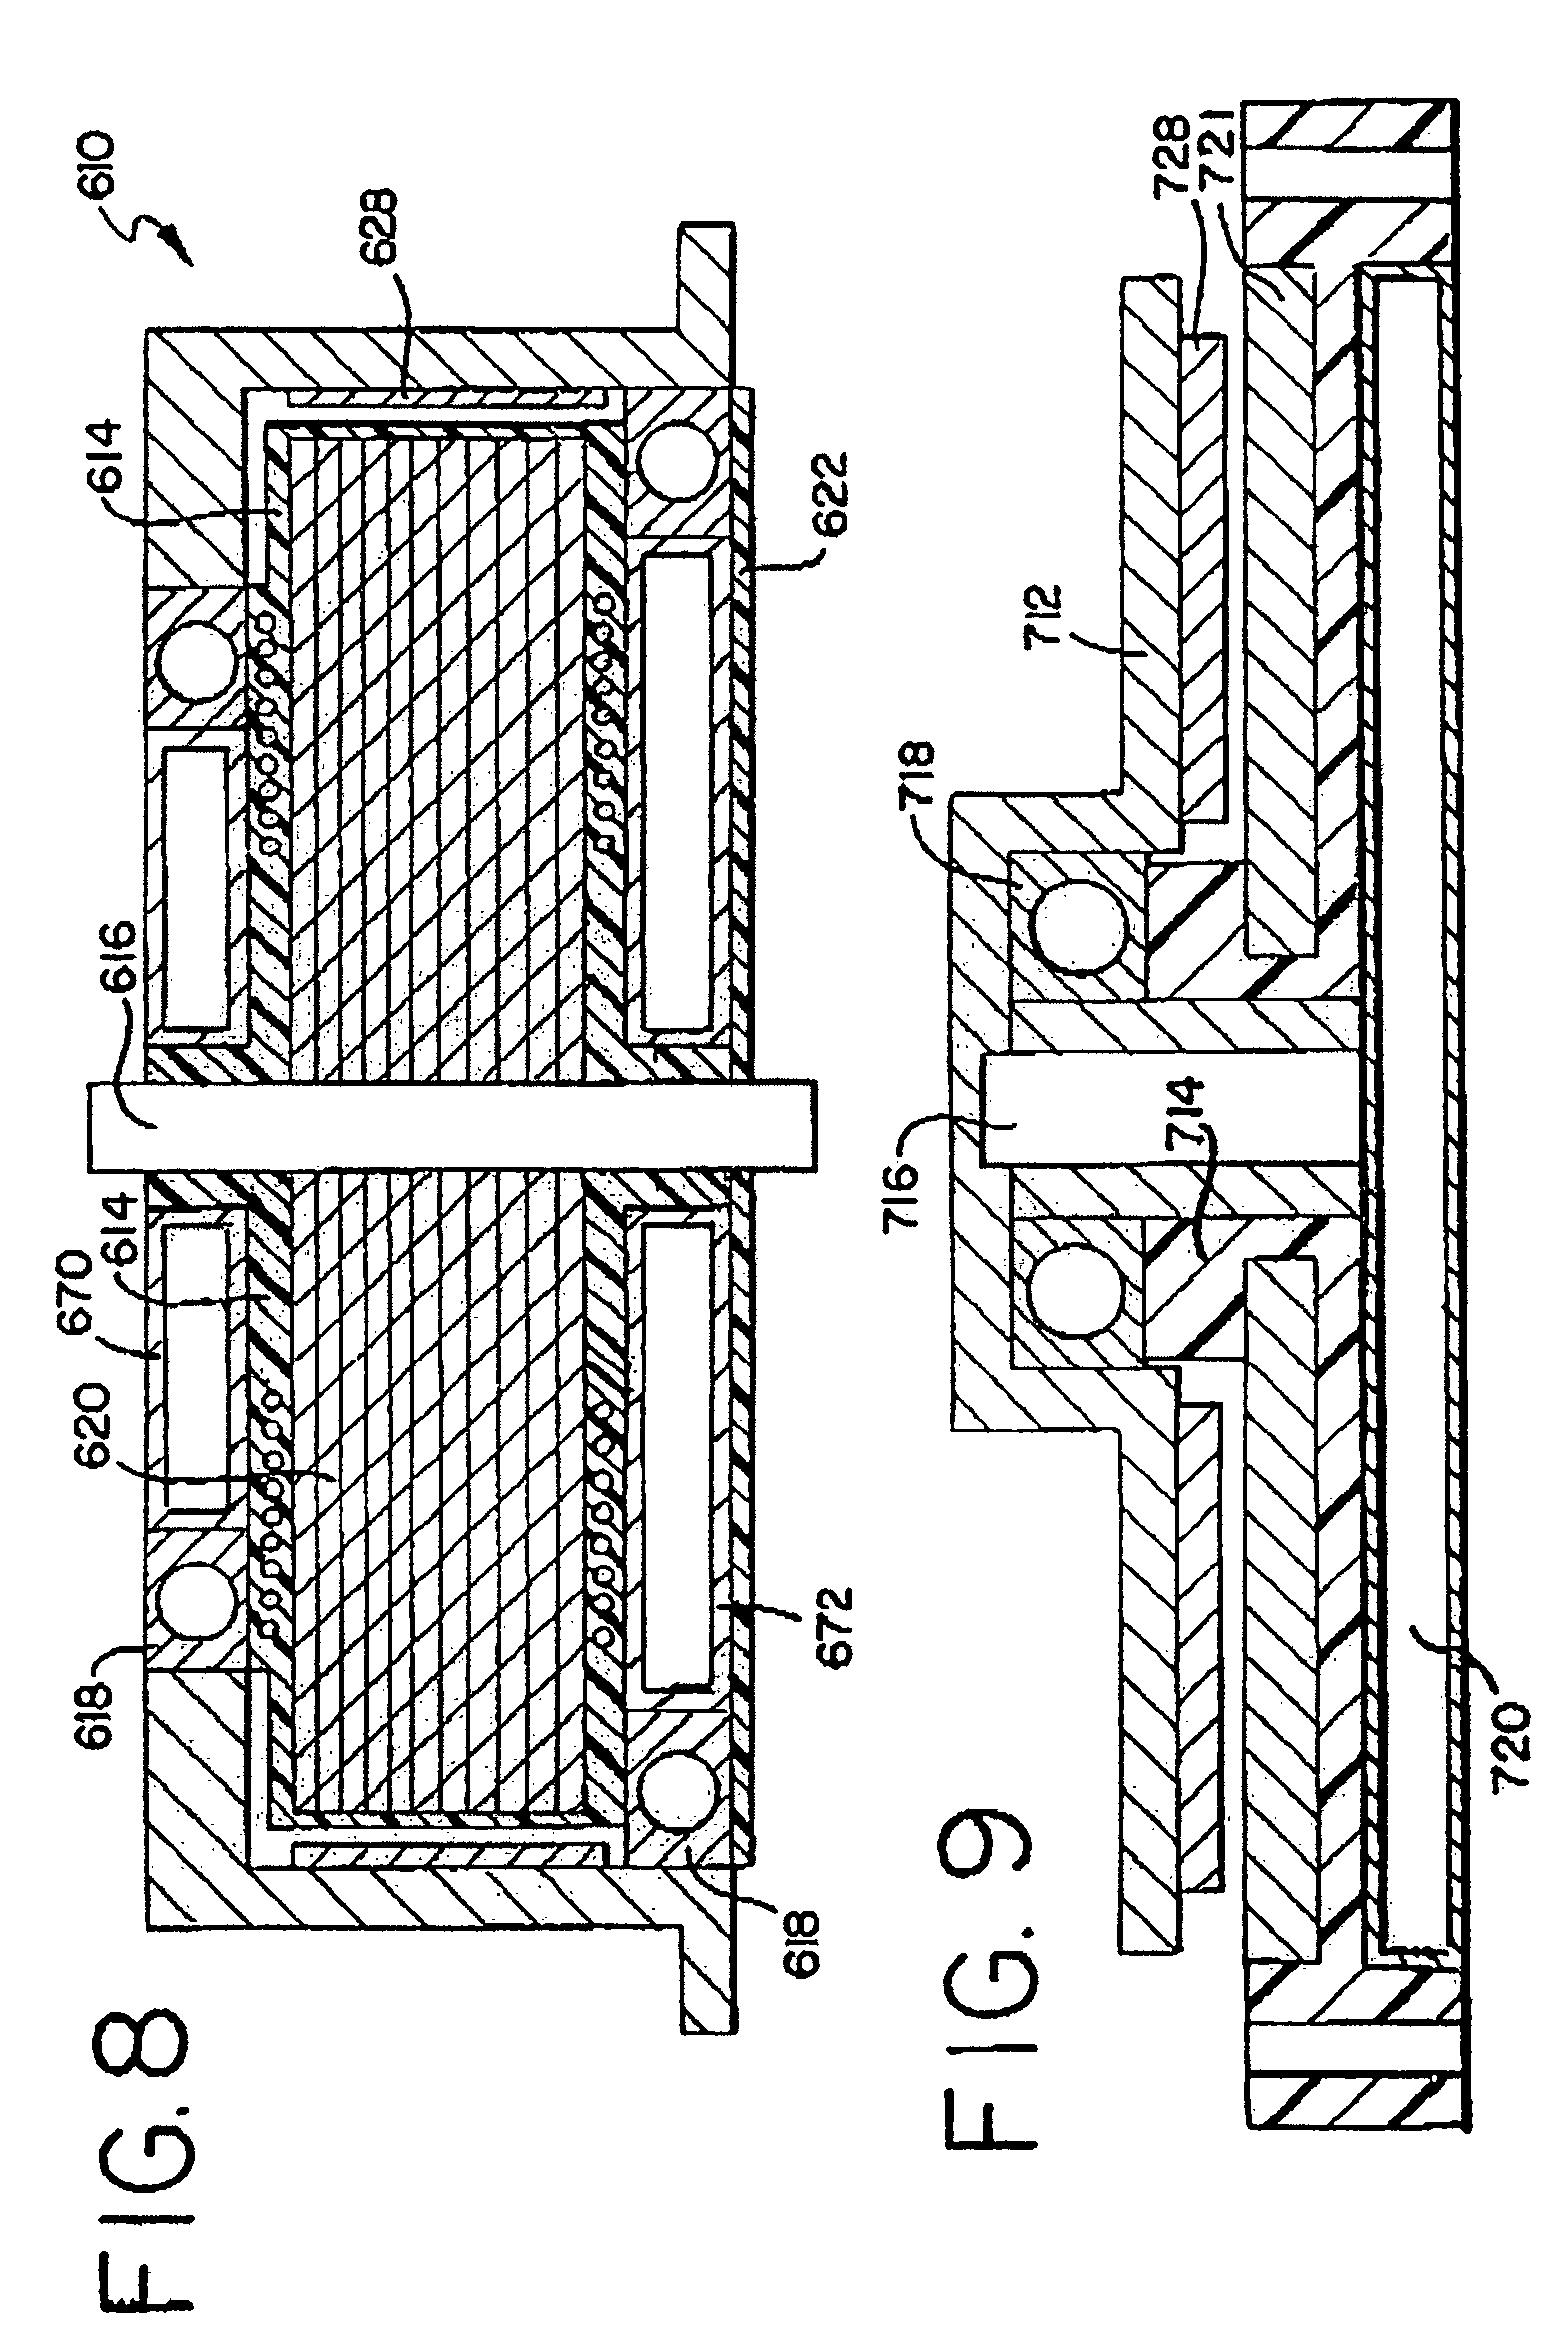 Patent US 7,683,509 B2 on